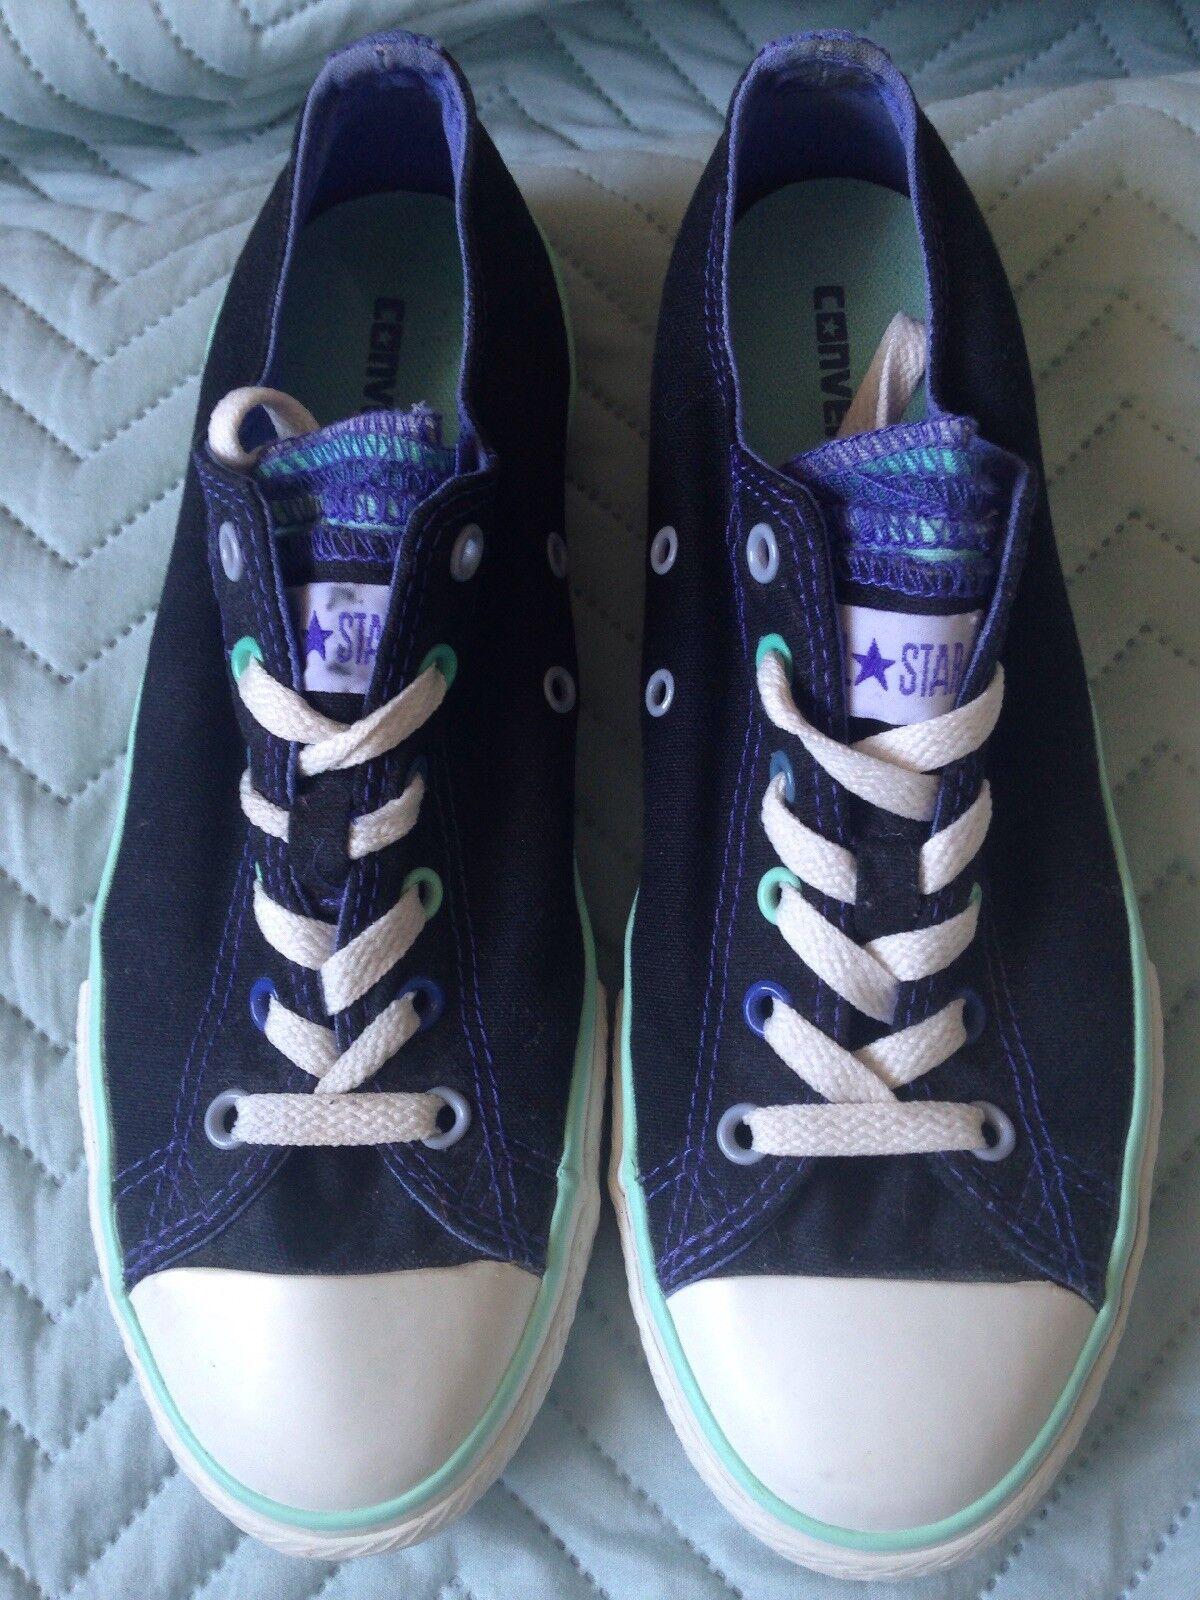 Femmes Filles Noir Converse All Star Tennis Baskets, peu porté, Taille UK 4.5